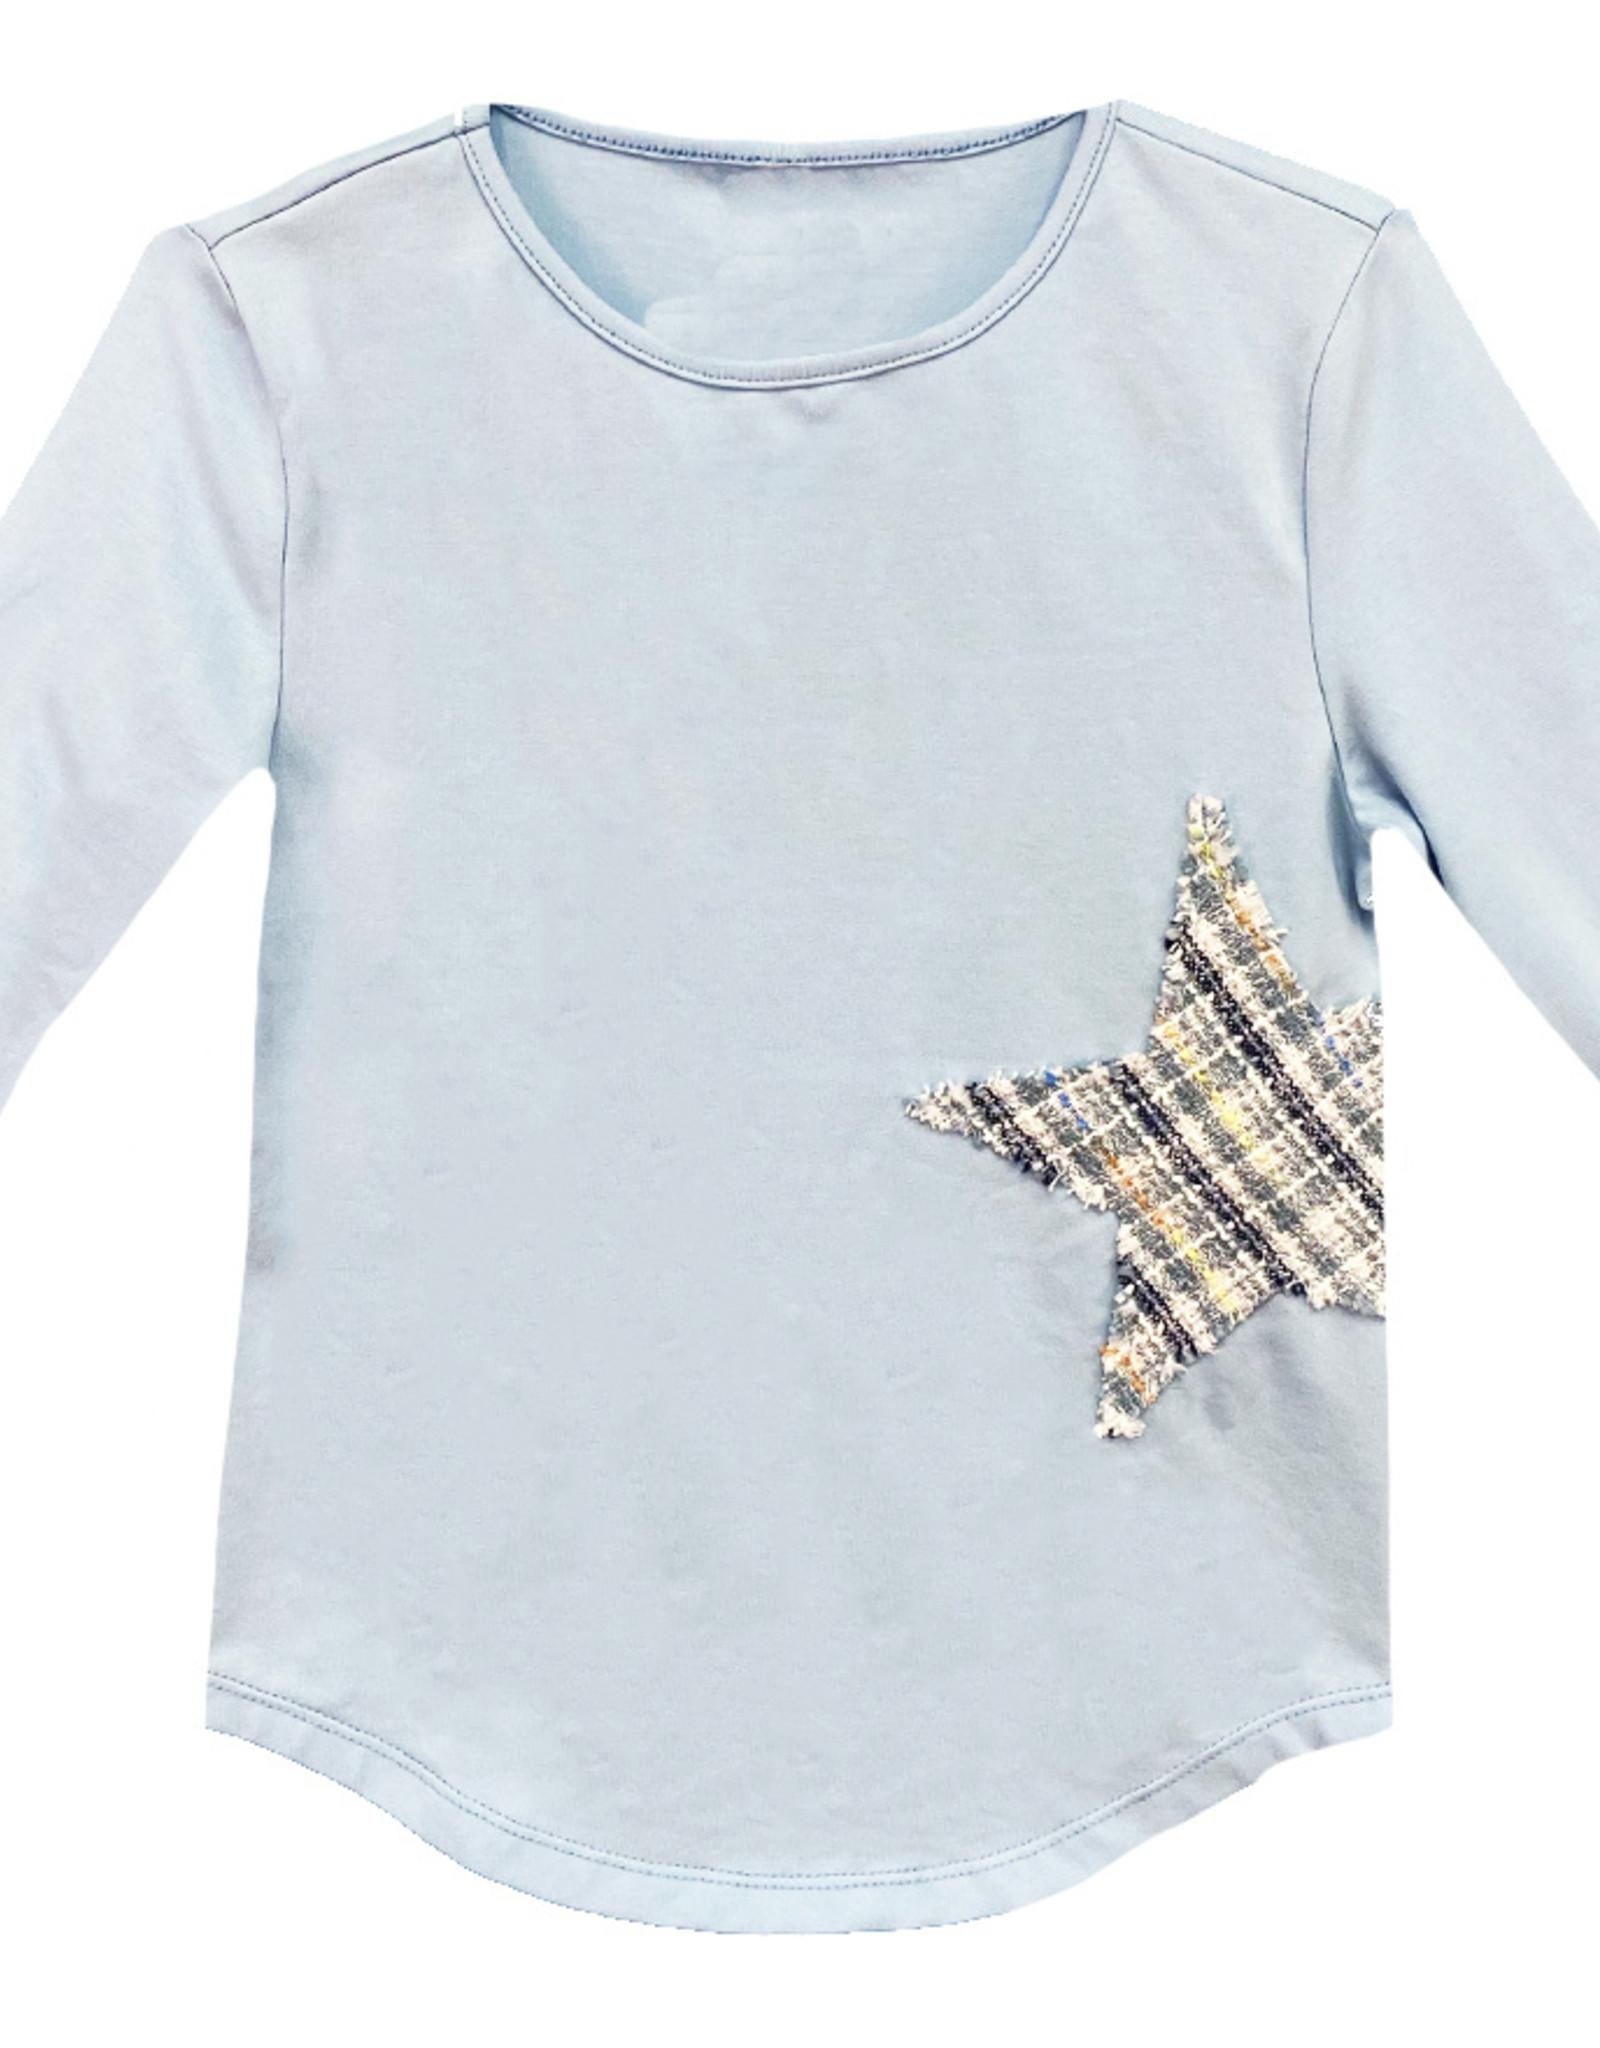 MeMe Basics MeMe Basics Tshirt with Star Tweed Patch